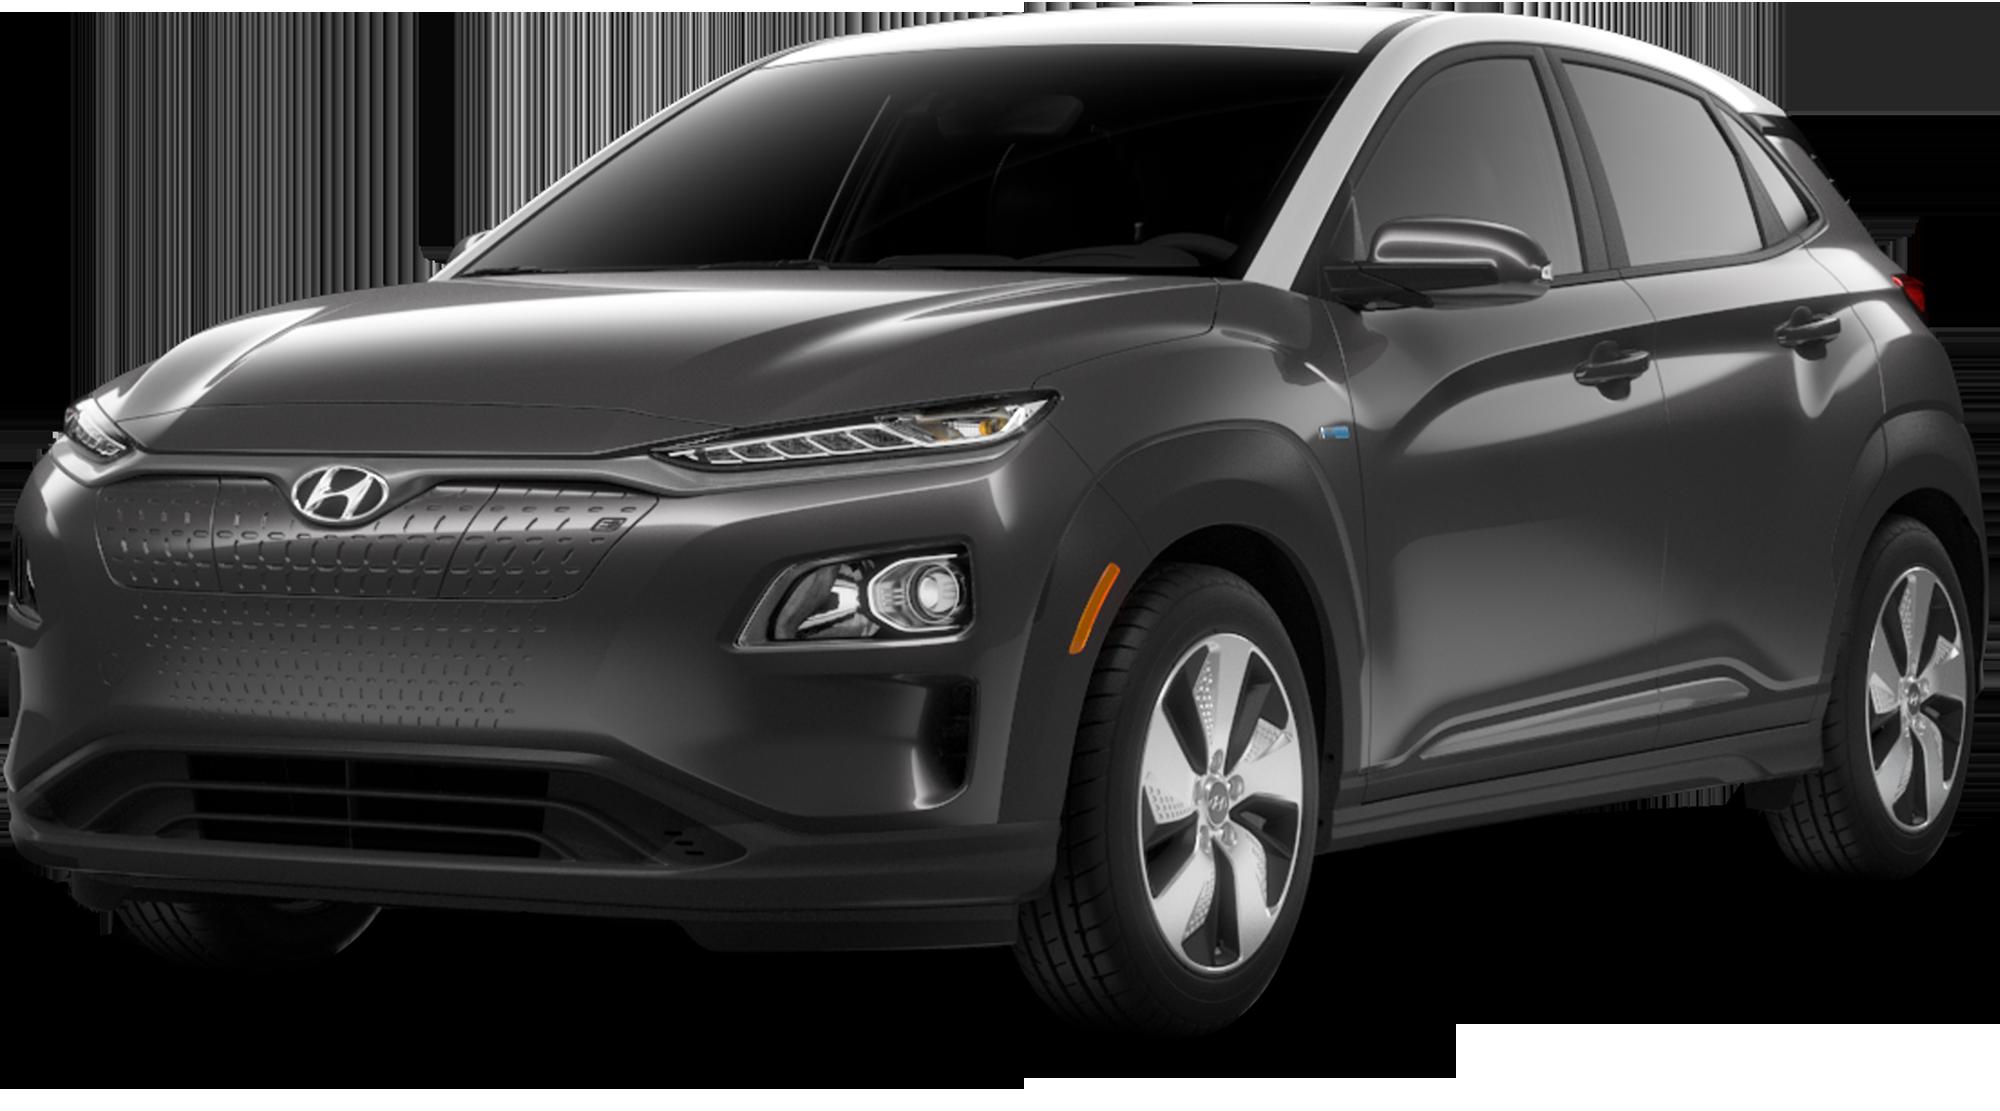 2020 Hyundai Kona EV Incentives, Specials & Offers In Palm